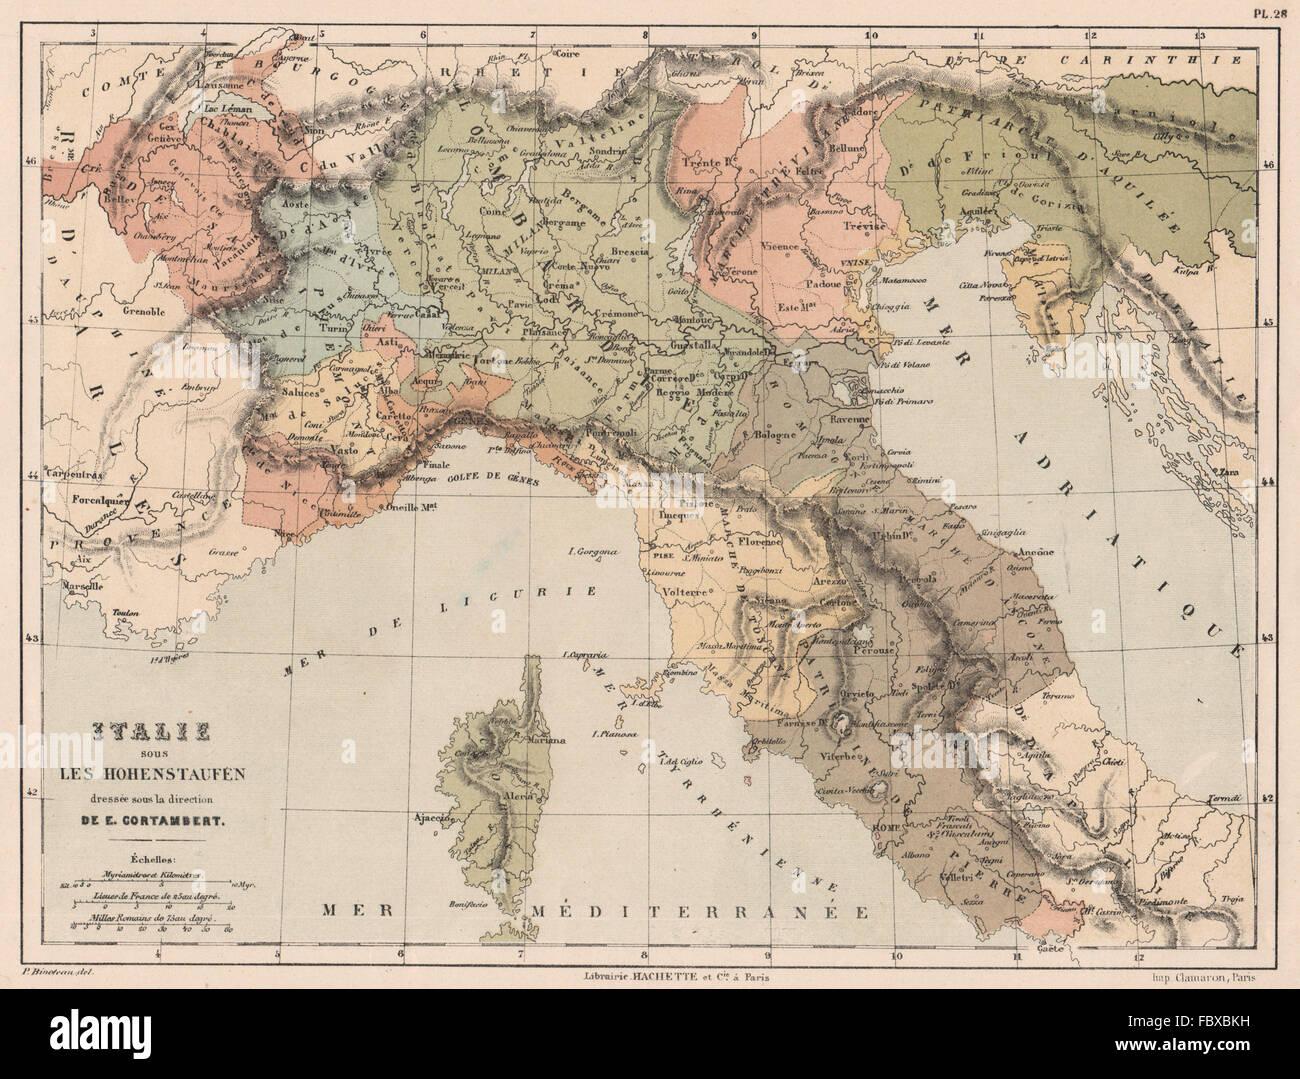 Norditalien Karte.Staufer Italien Norditalien 12 Jahrhundert Swabia